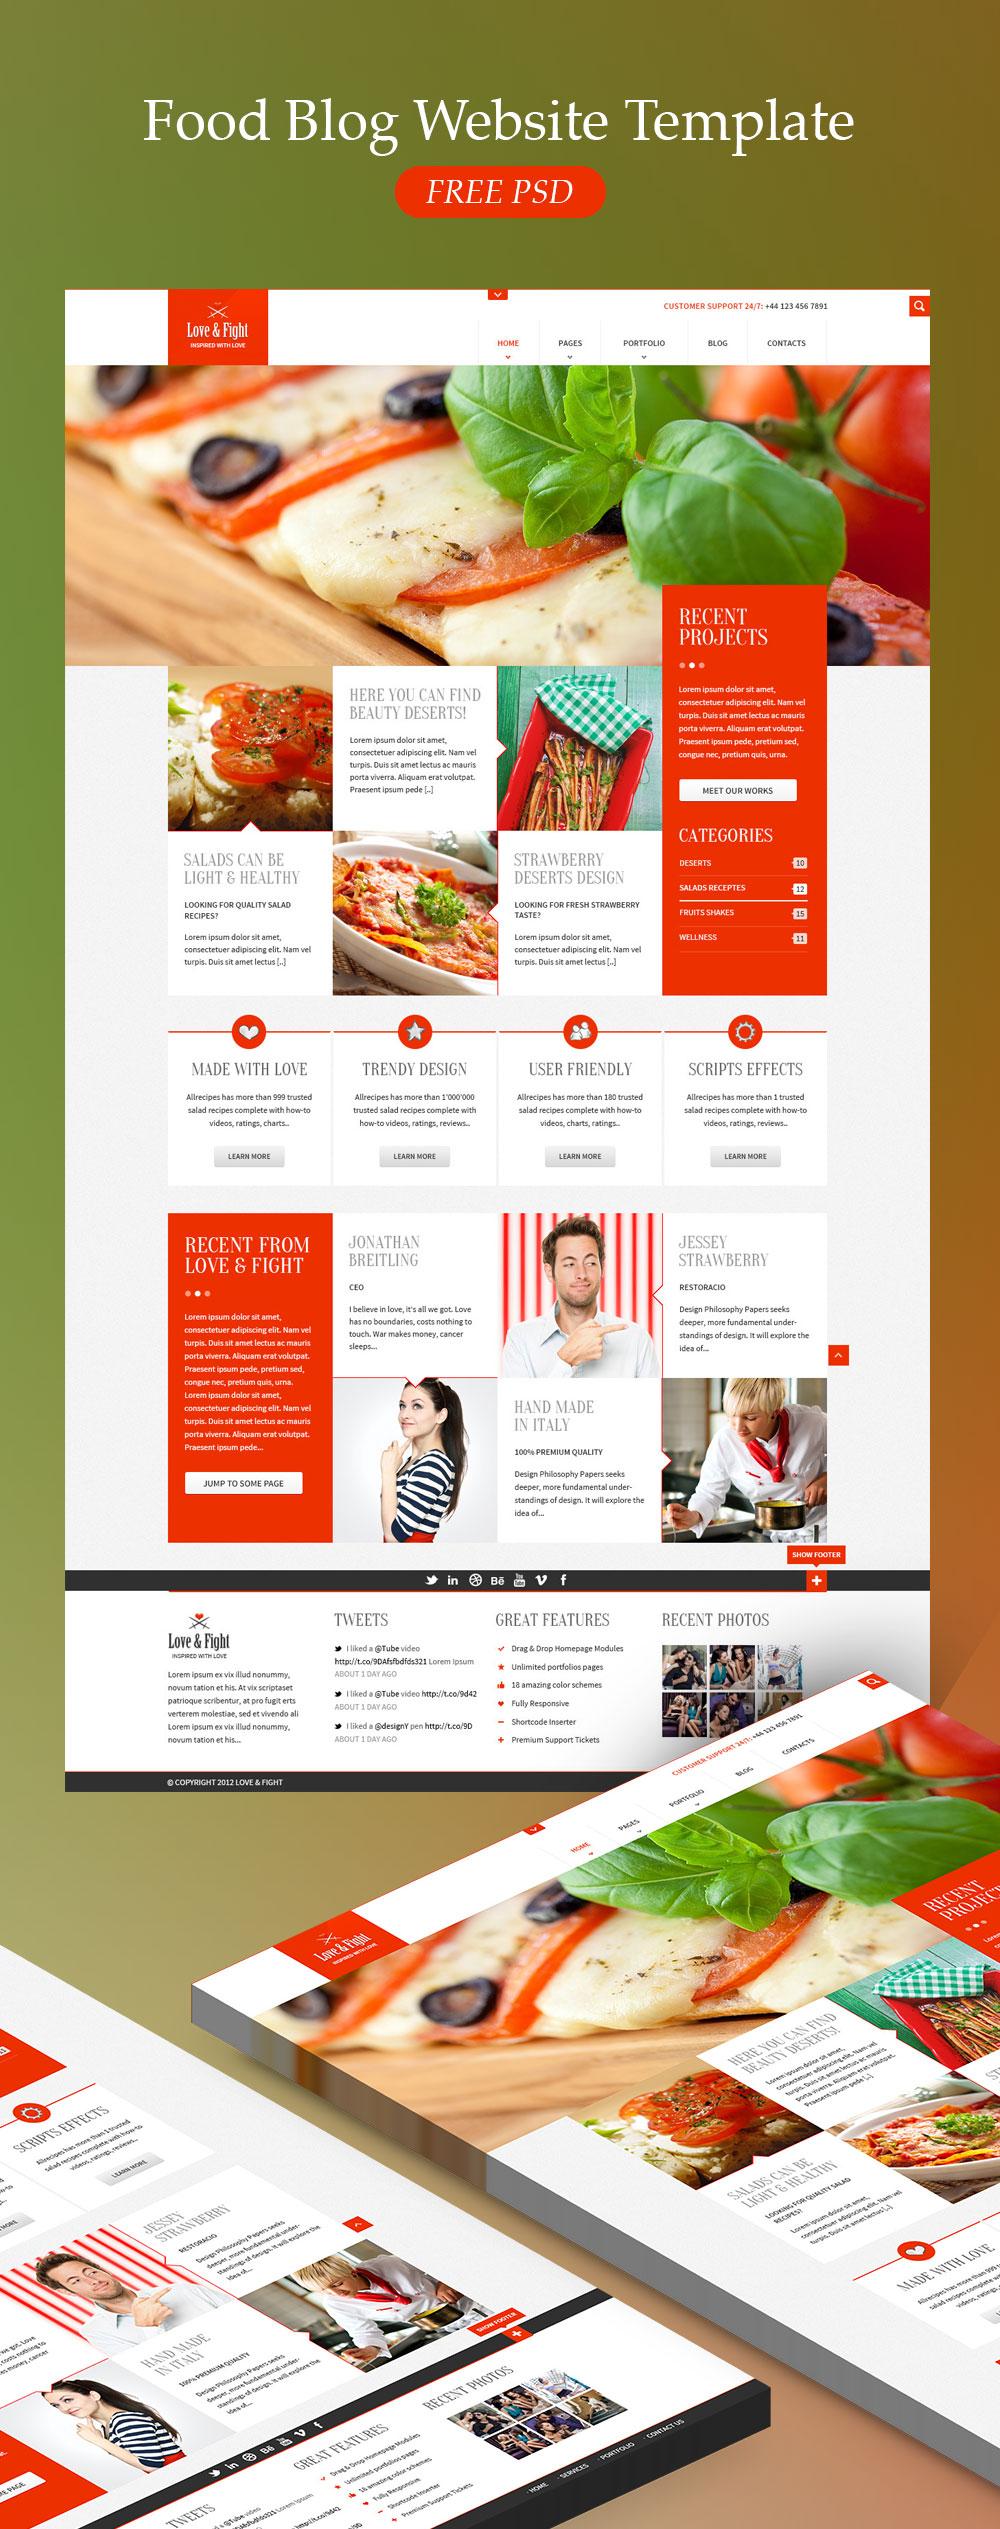 Food Blog Website Template Free PSD Download - Download PSD